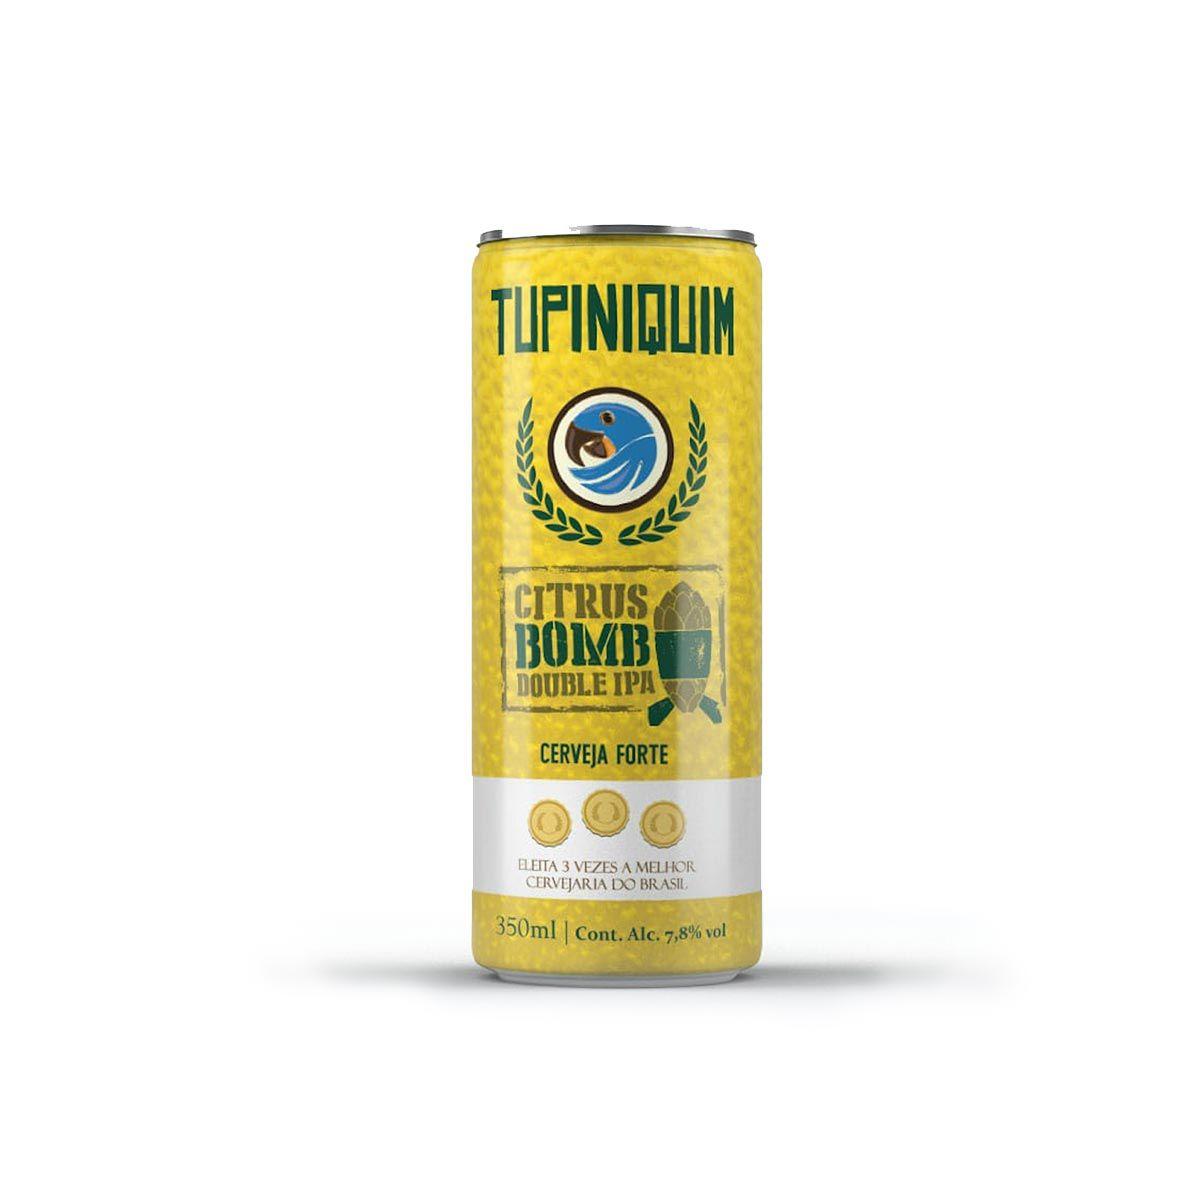 Tupiniquim Citrus Bomb Double IPA 350ml